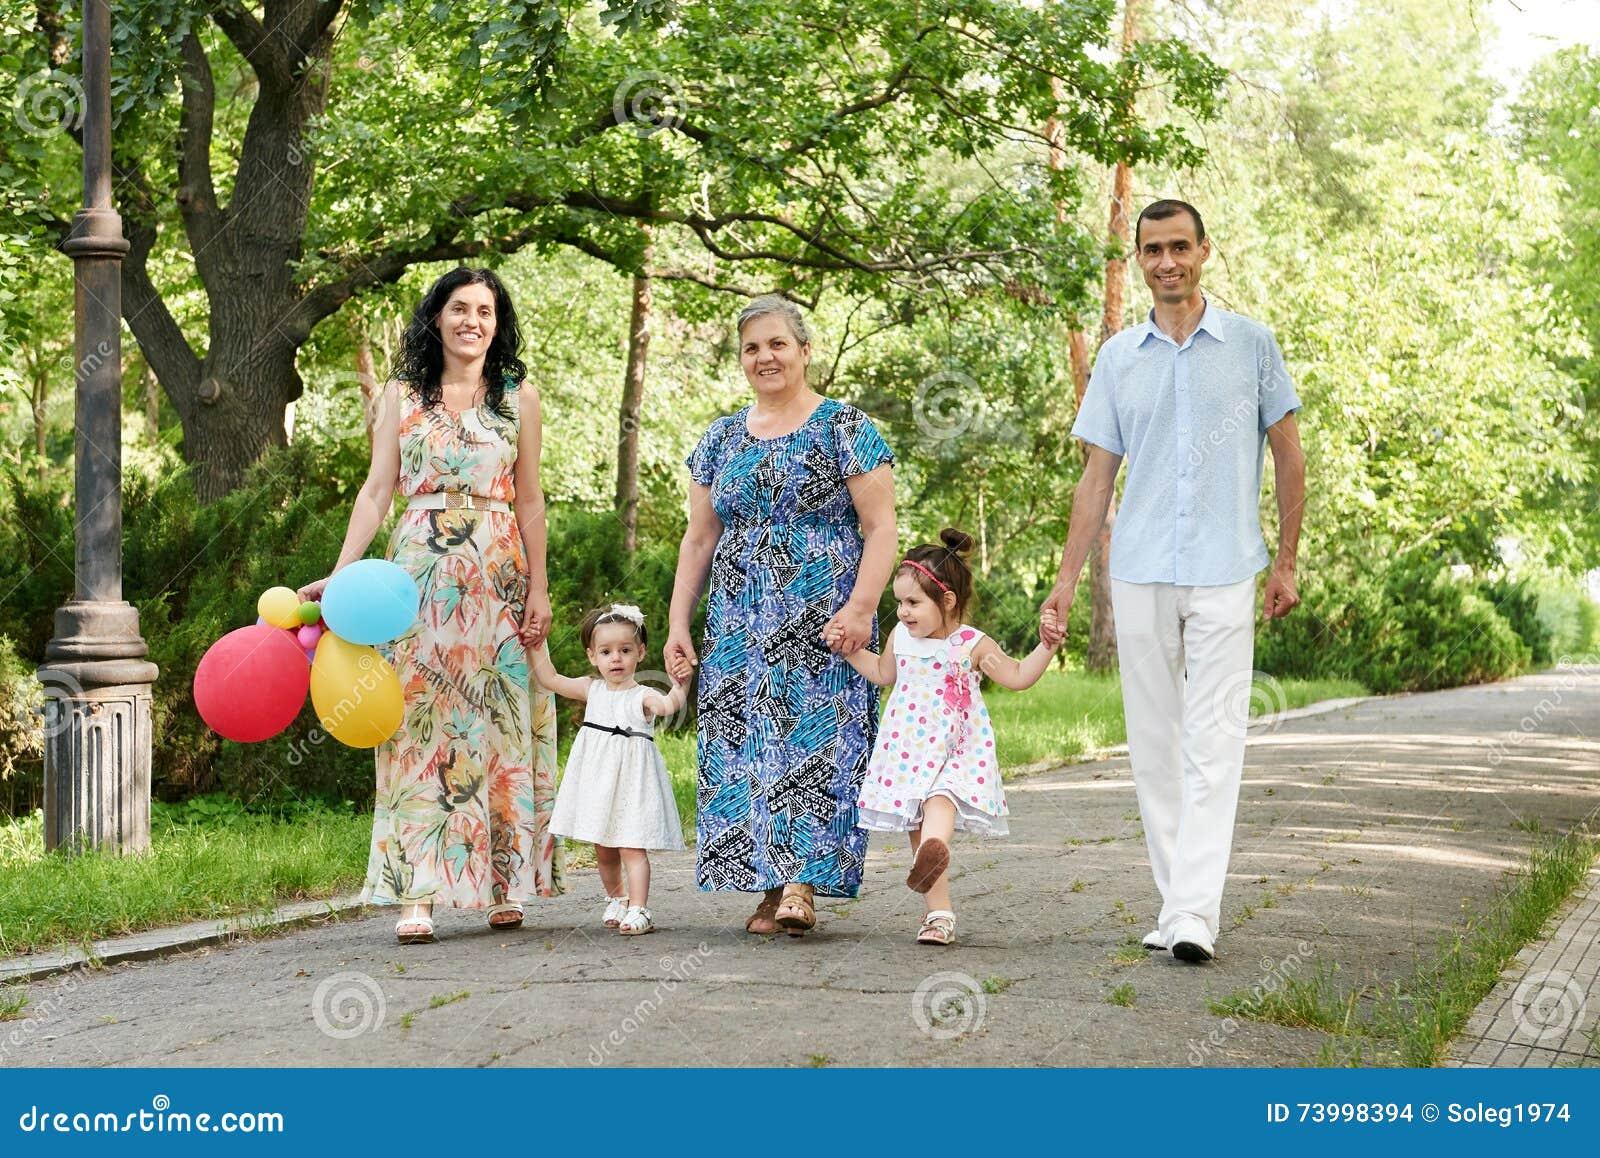 7ad74fb37c6 Μεγάλος οικογενειακός περίπατος στο πάρκο θερινών πόλεων, γονείς με το παιδί  και τη γιαγιά,